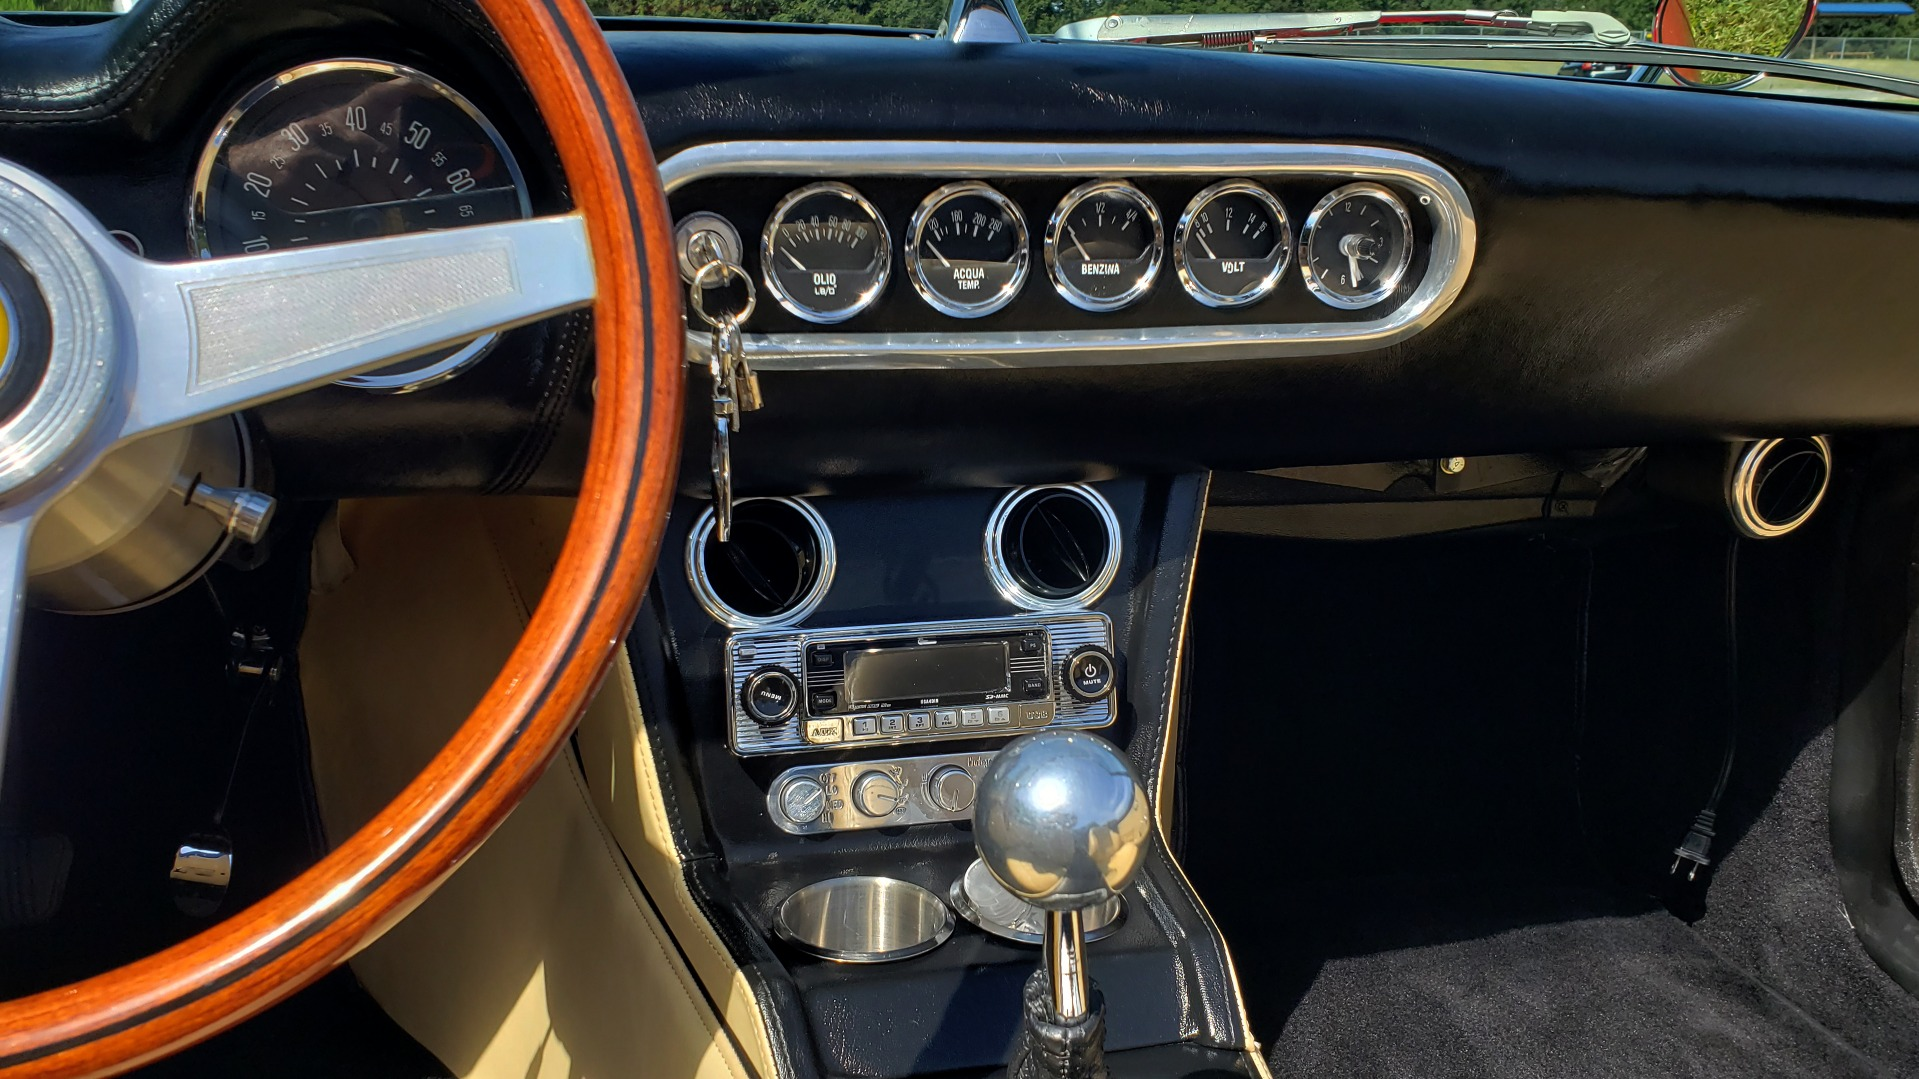 Used 1961 Ferrari 250GT SWB CALIFORNIA REPLICA / 302CI V8 / TREMEC 5-SPEED for sale Sold at Formula Imports in Charlotte NC 28227 22